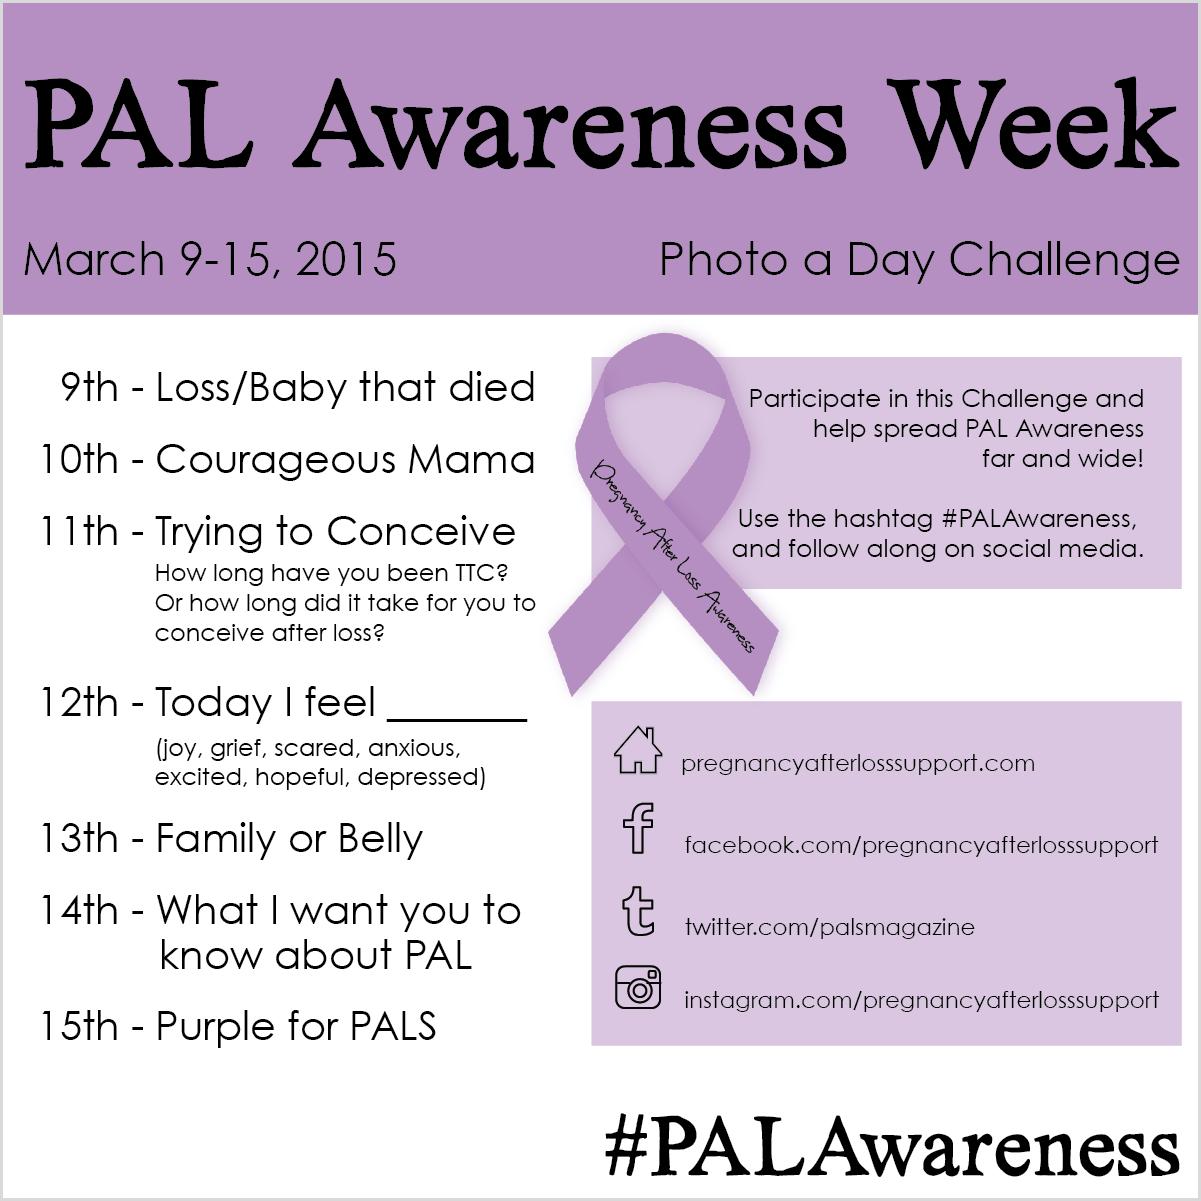 #PALAwareness Week